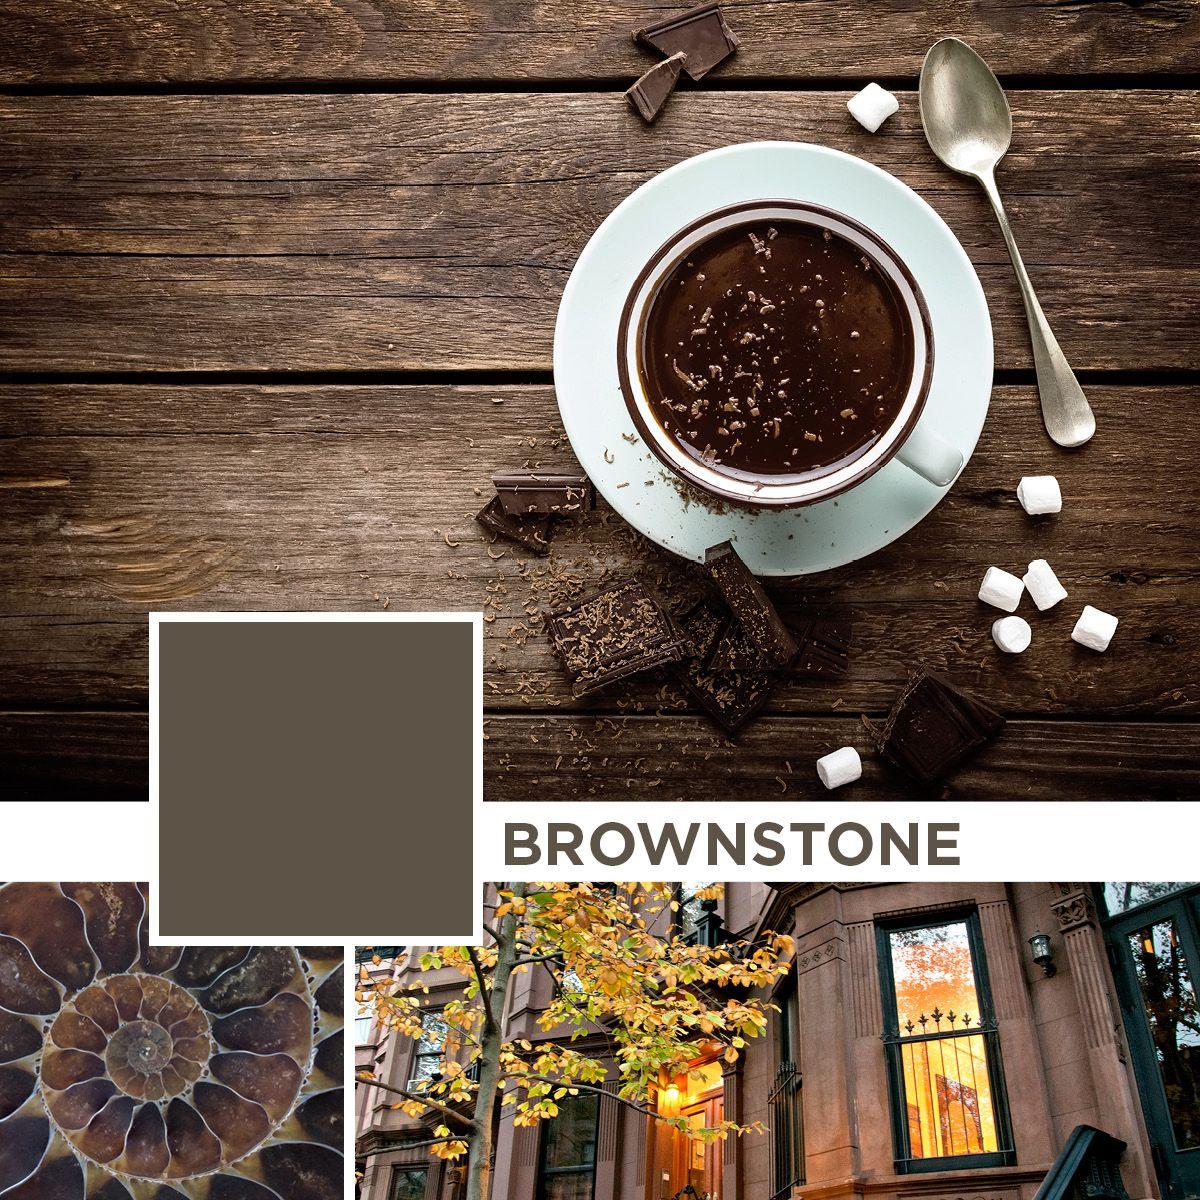 House Exterior Color Schemes Home Exterior Color Combinations Ply Gem House Exterior Color Schemes Exterior Color Schemes Exterior Color Combinations